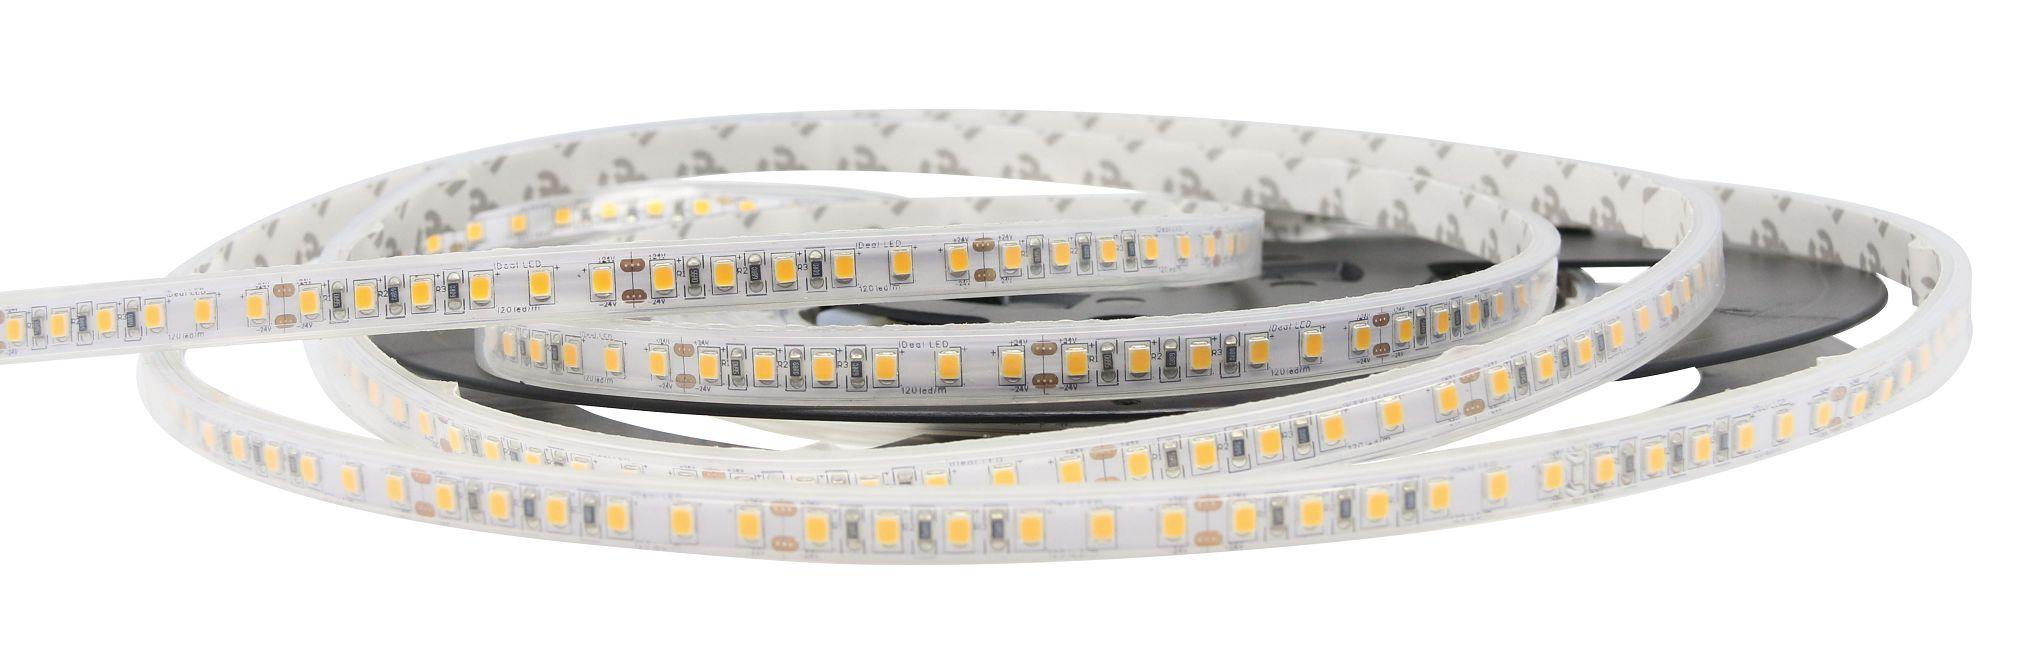 LED Striplight S23120-24-WP-14.4w